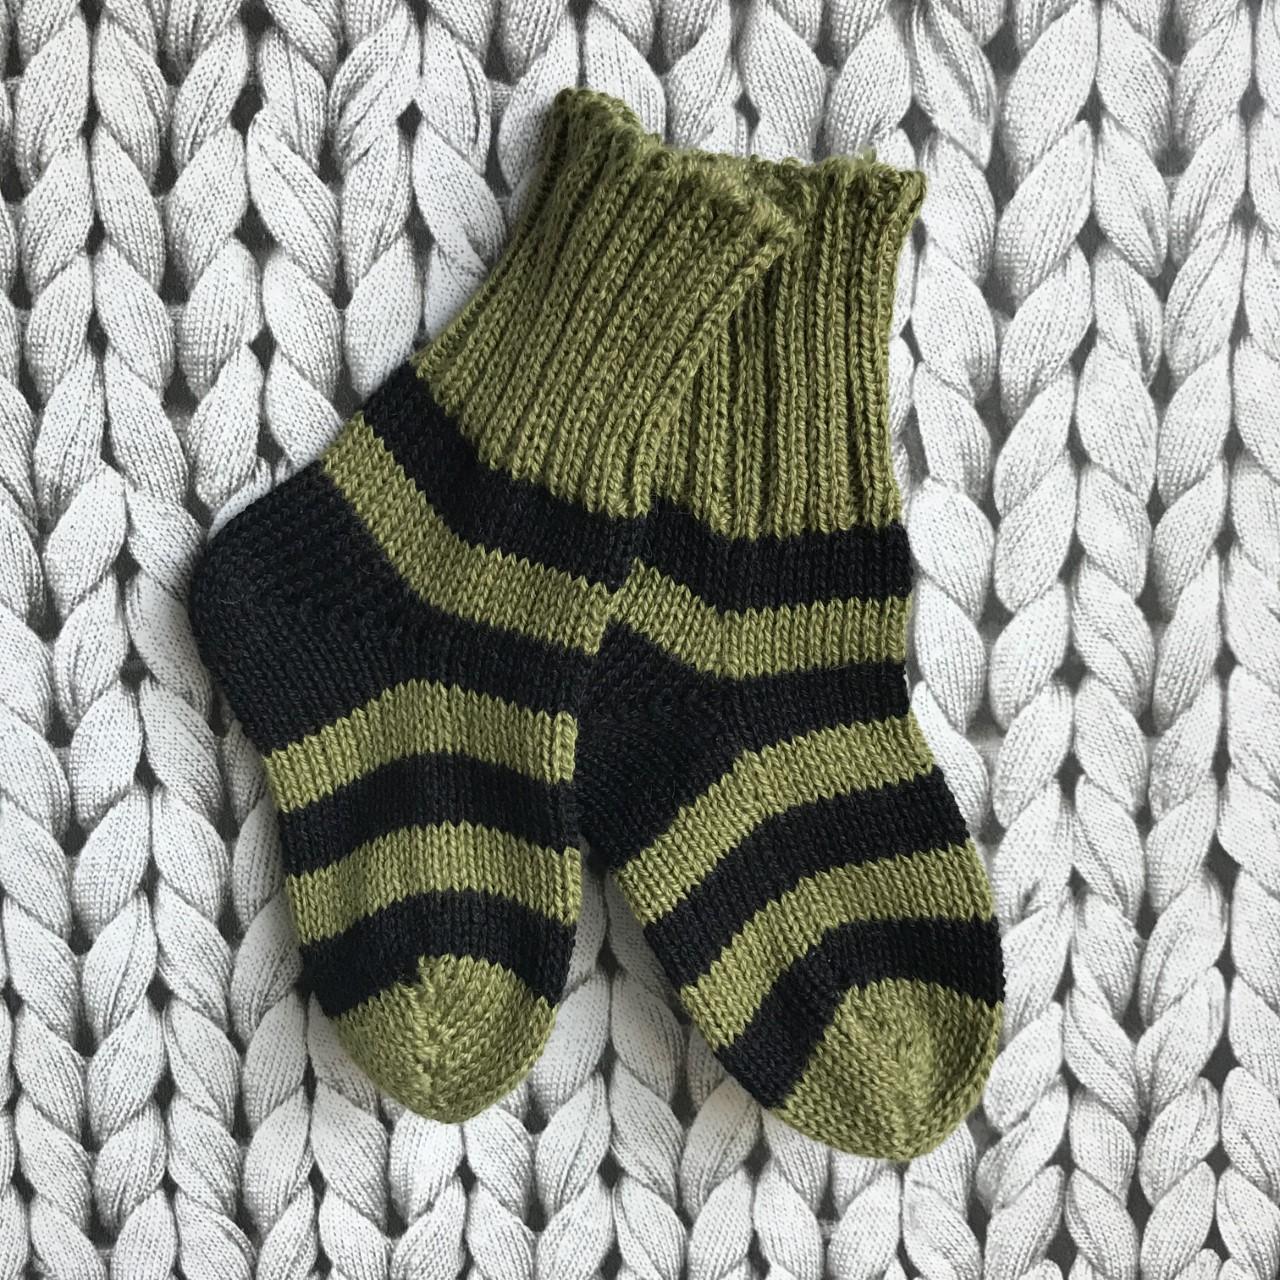 grön/svart barnsocka